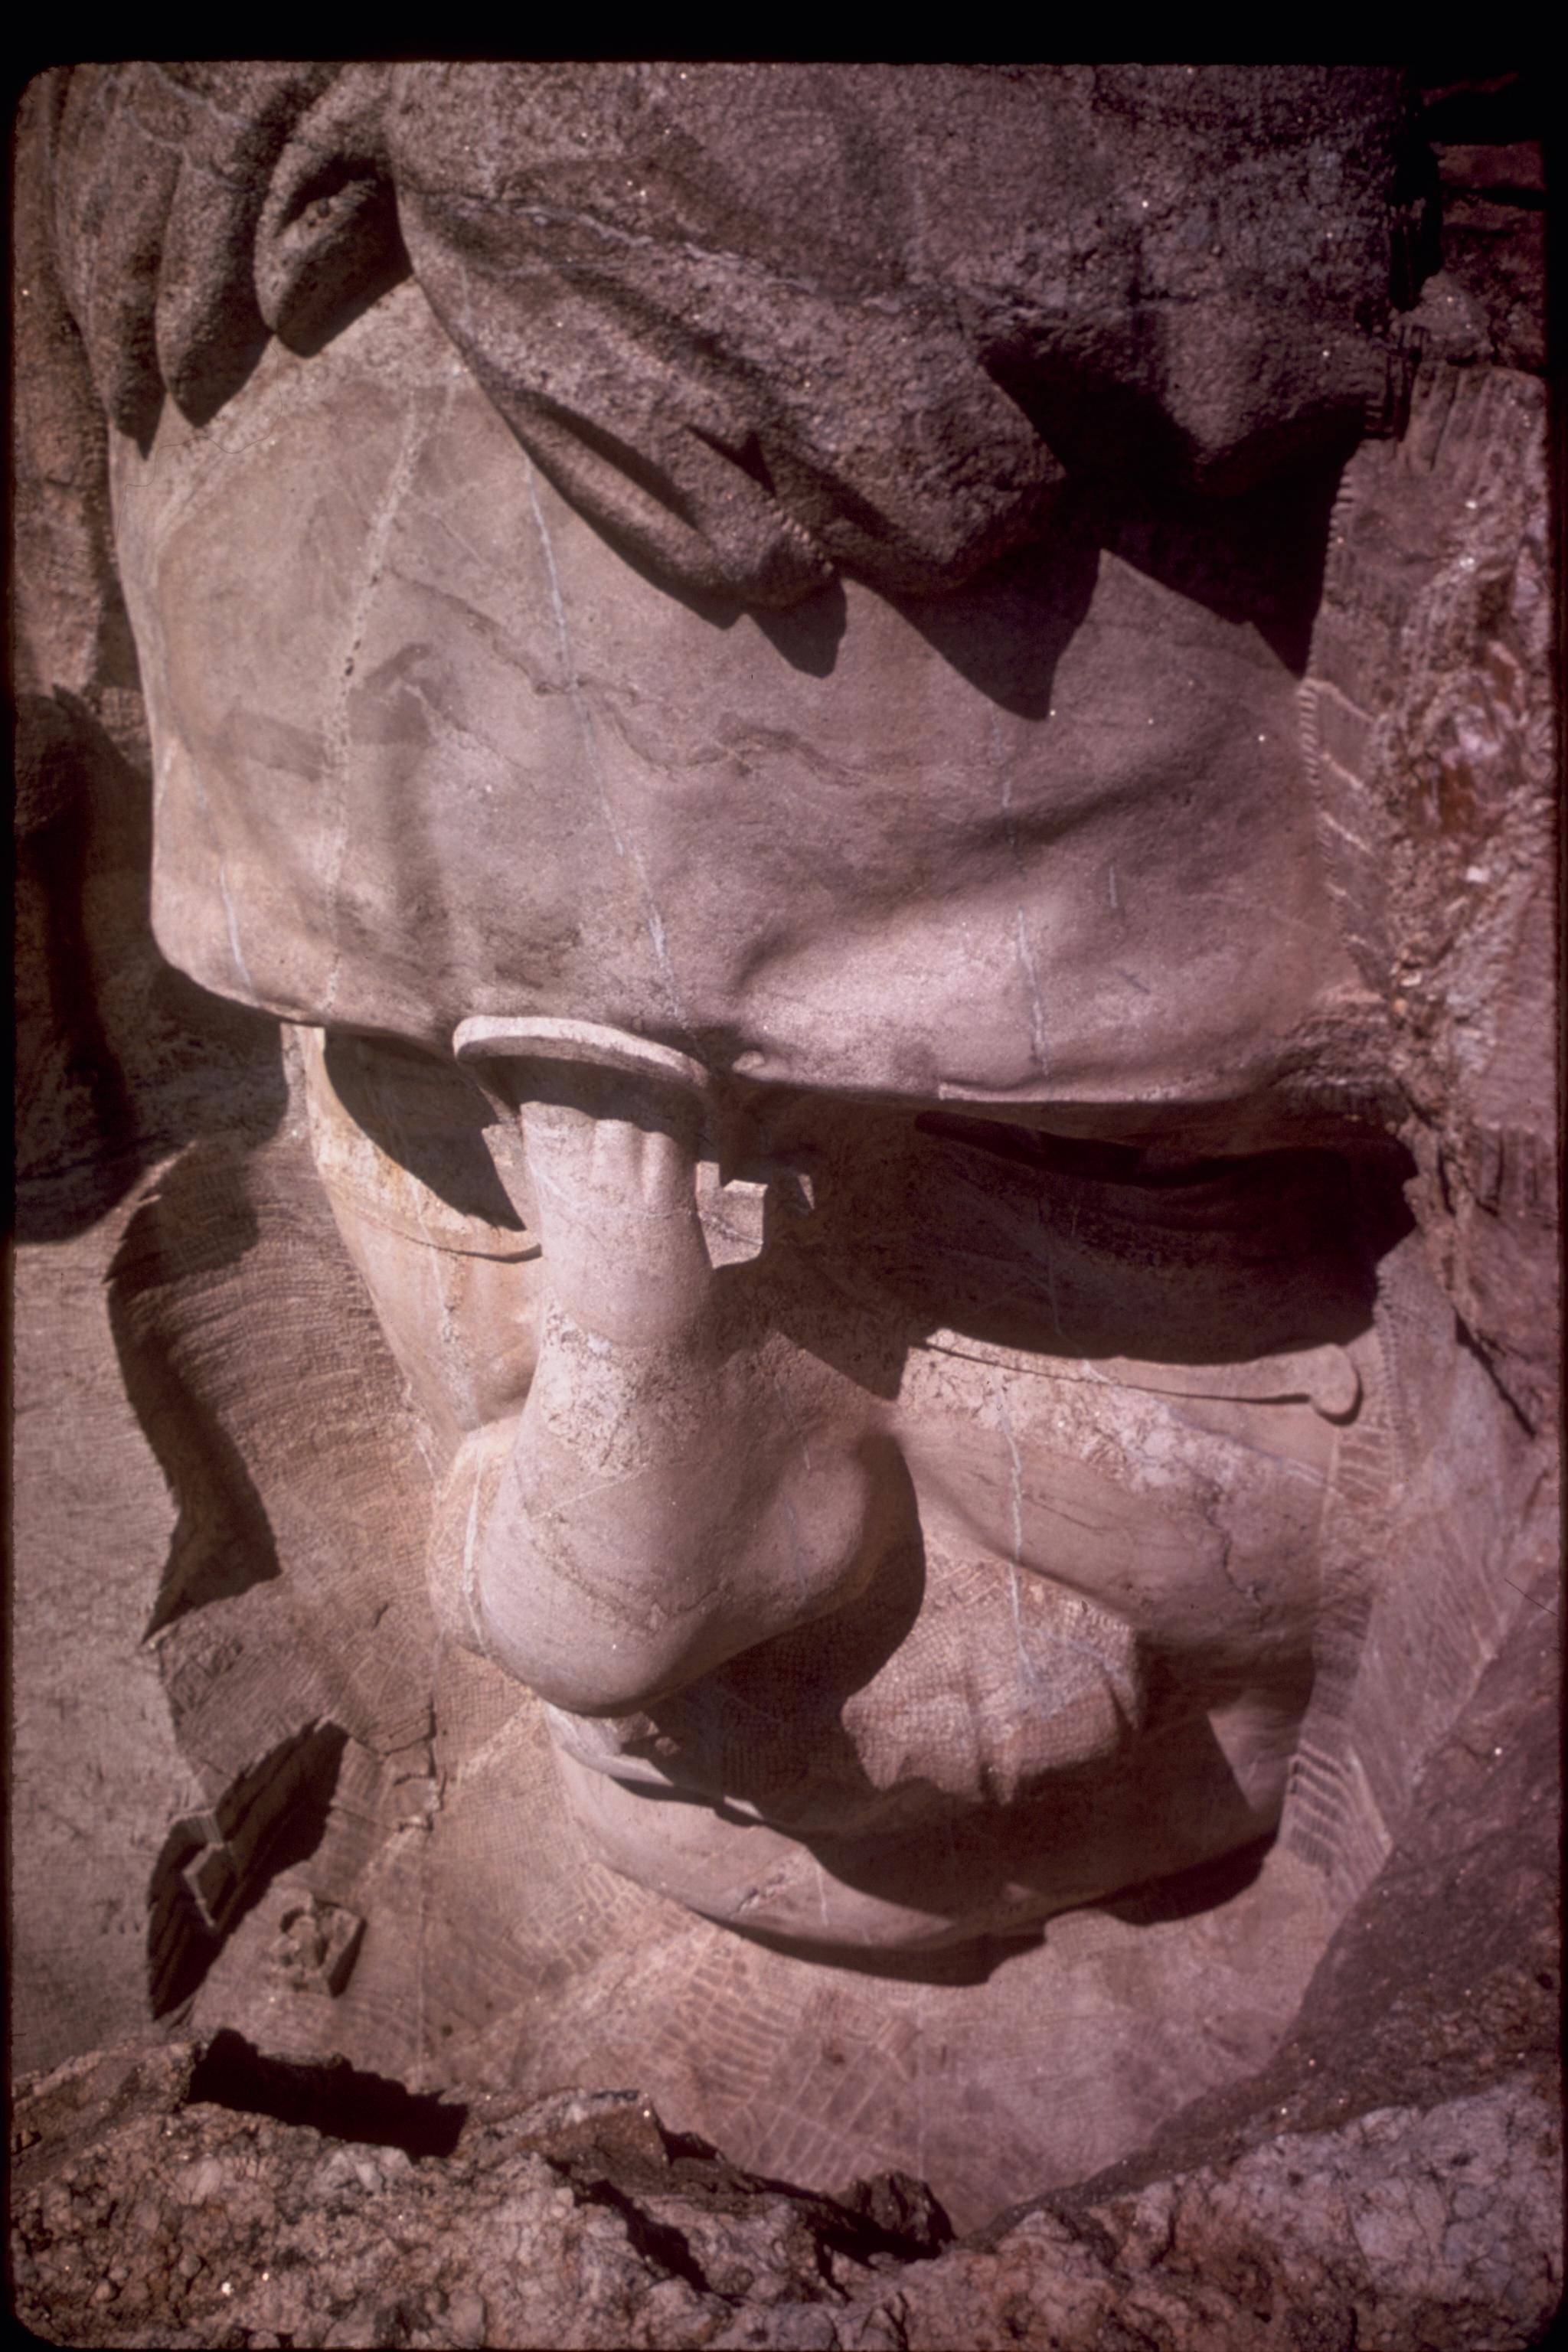 http://upload.wikimedia.org/wikipedia/commons/a/a6/Mount_Rushmore_National_Memorial_MORU2000.jpg